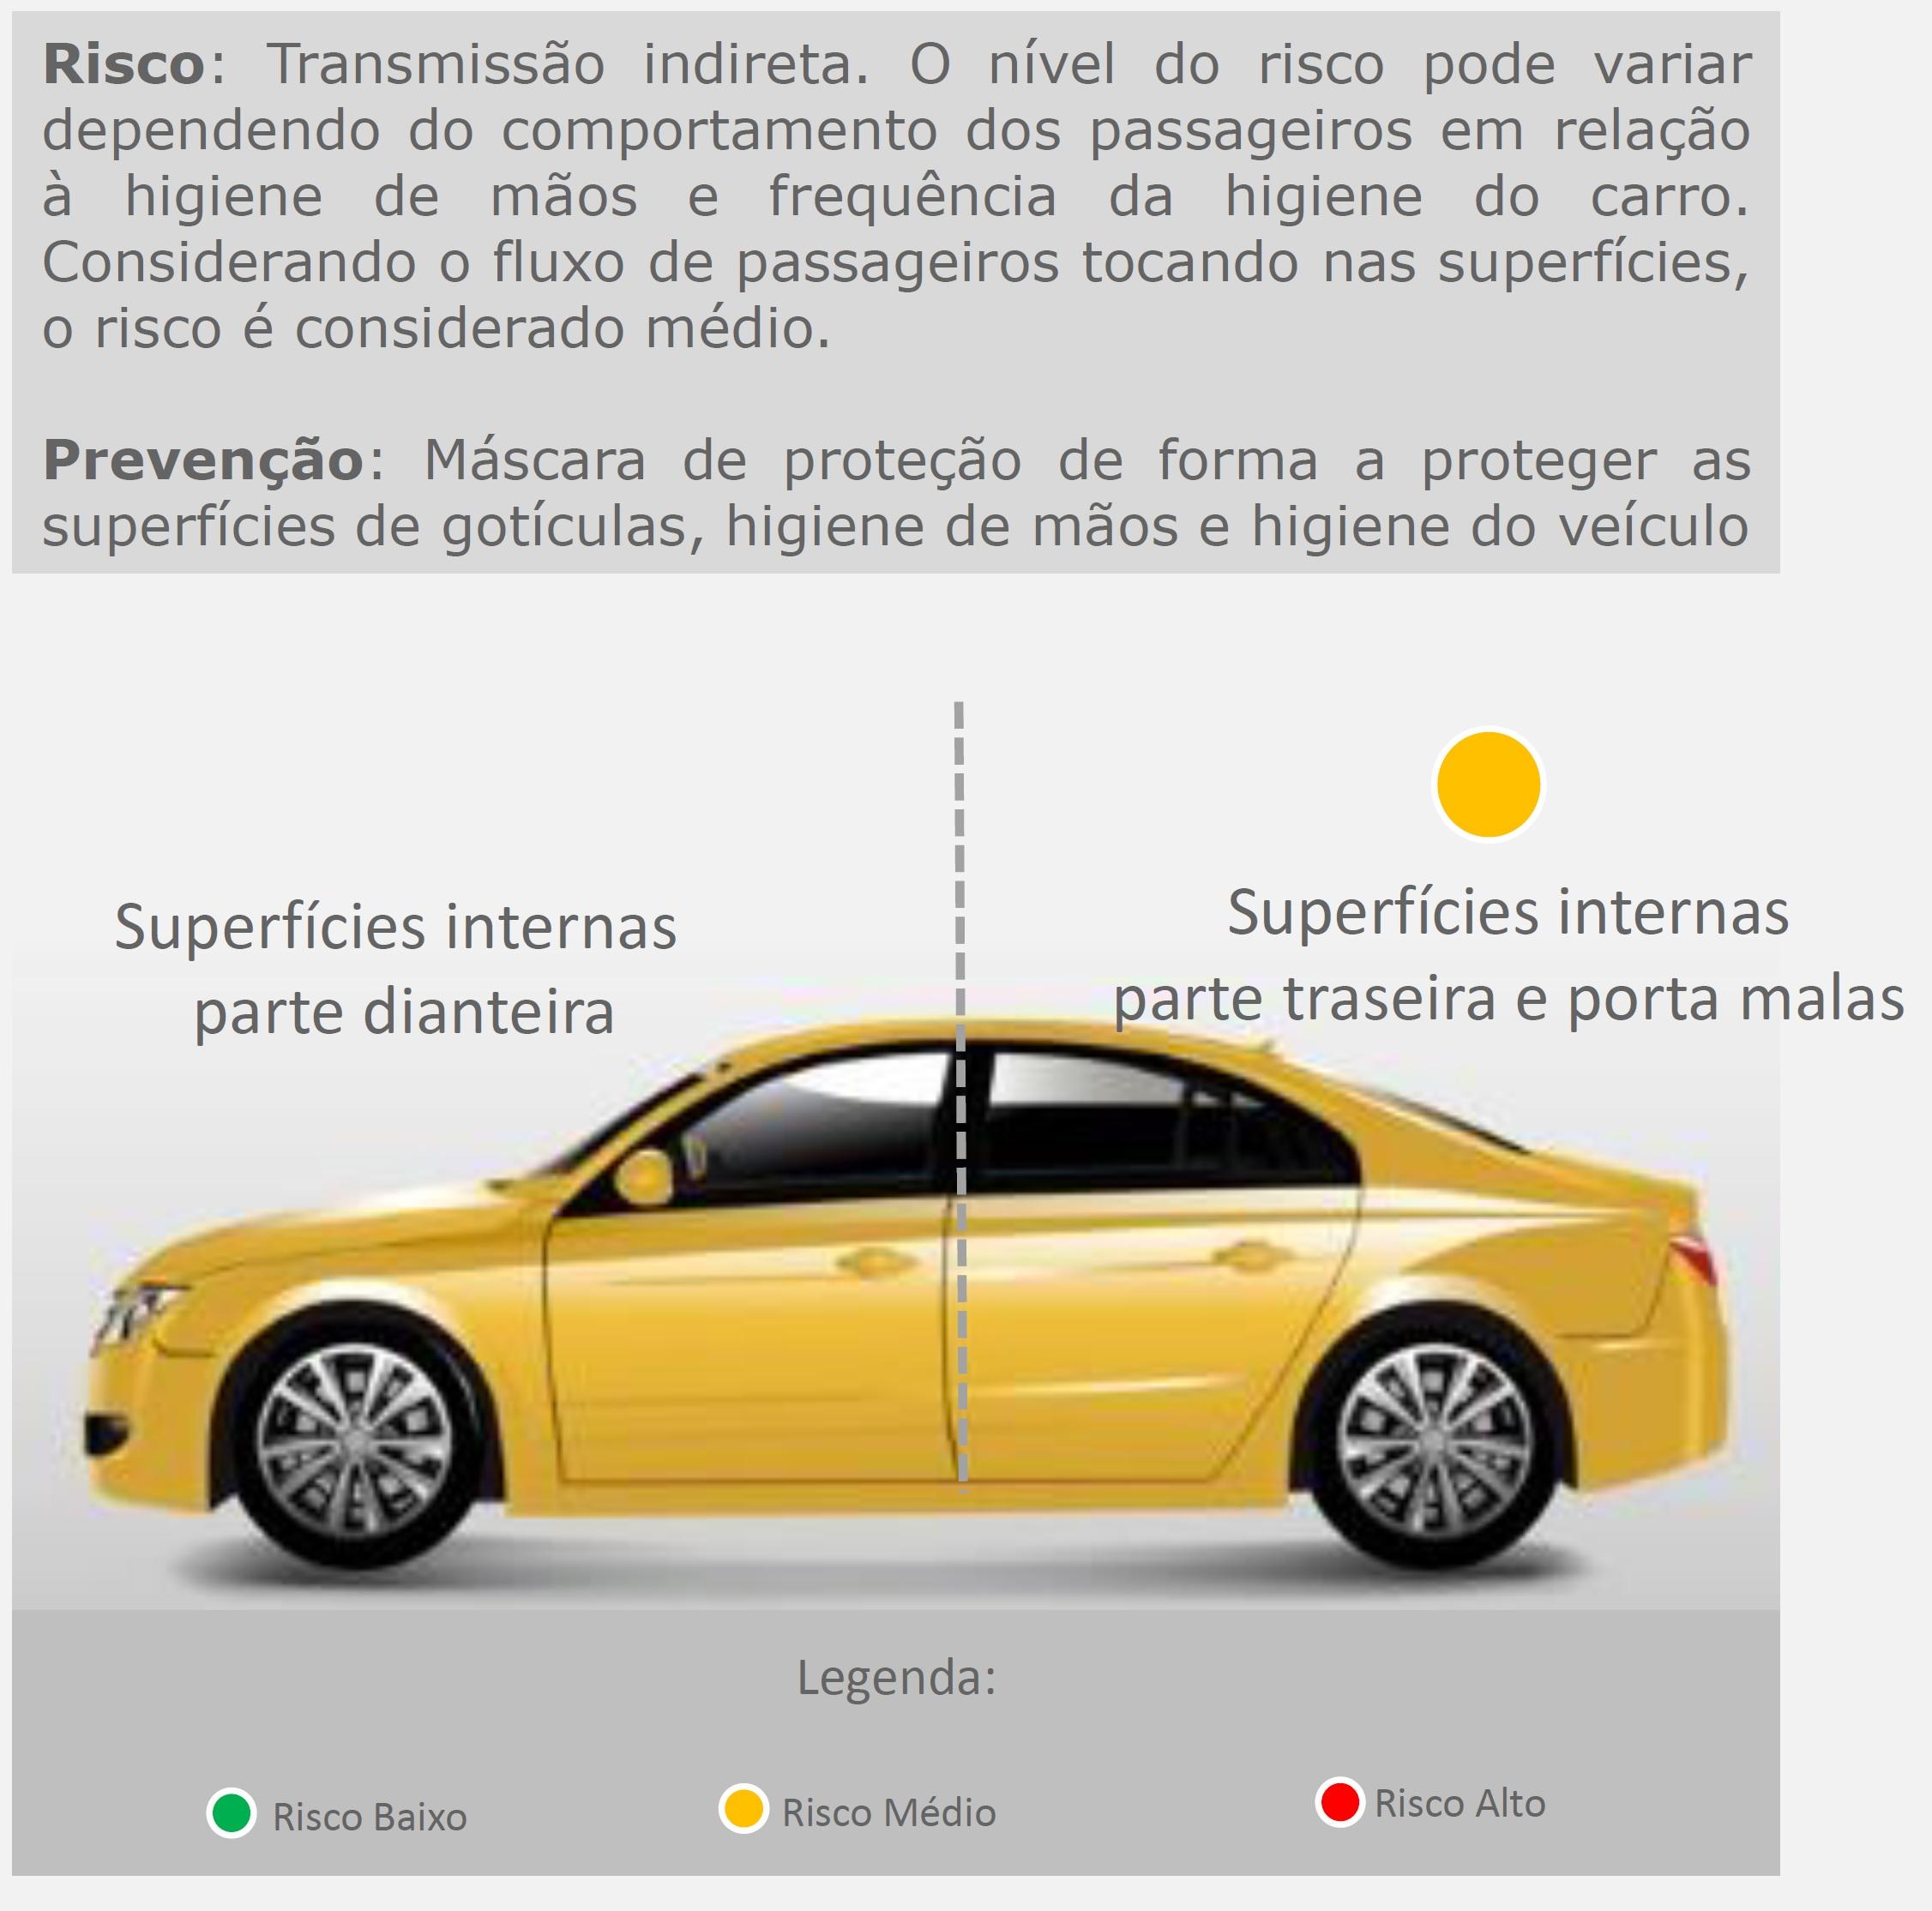 Superfícies internas traseiras e porta-malas: sinal amarelo